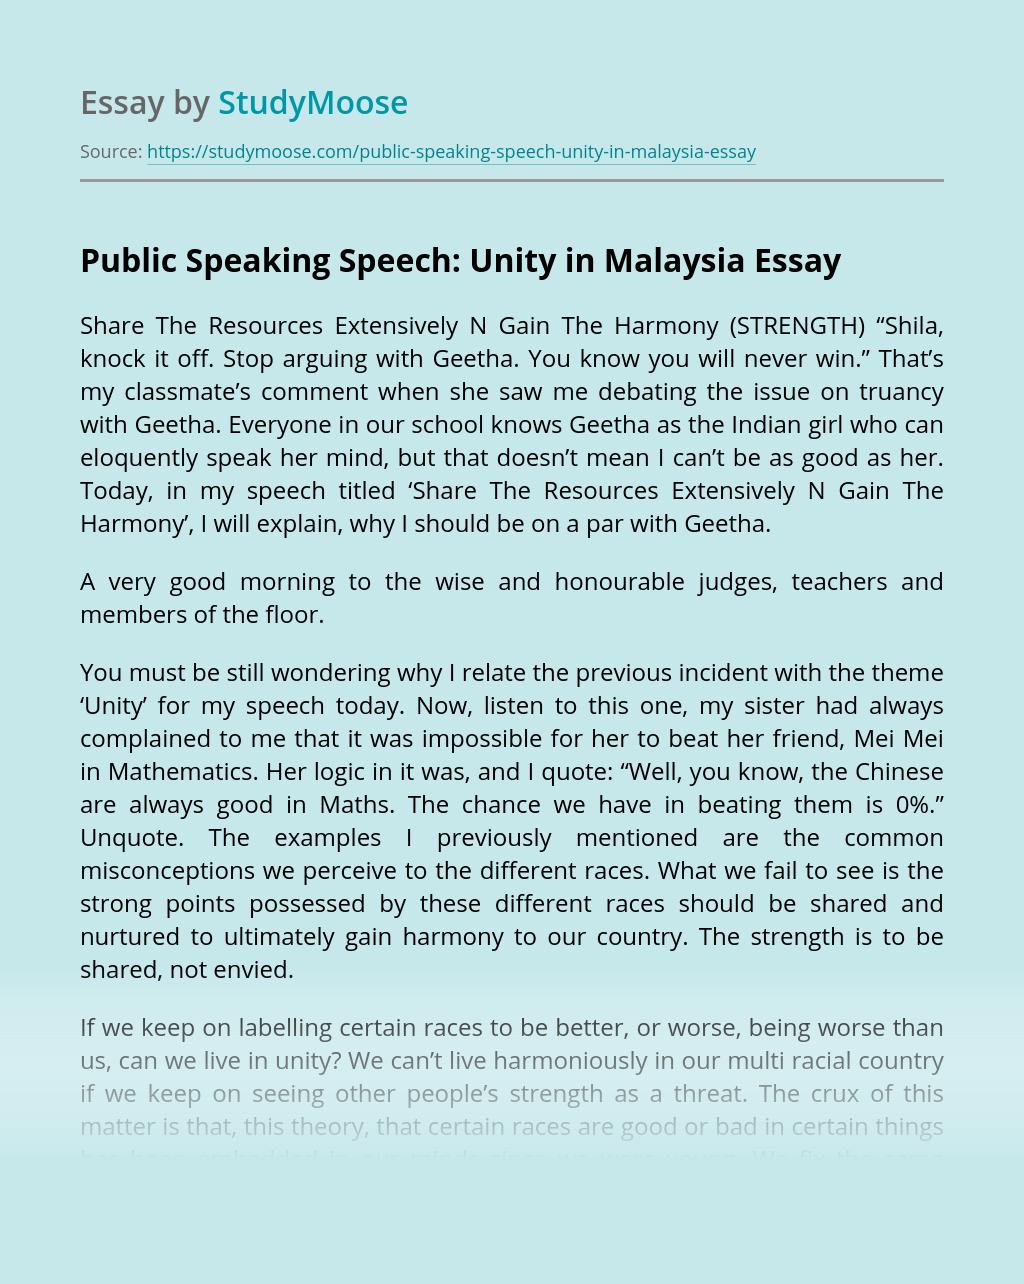 Public Speaking Speech: Unity in Malaysia